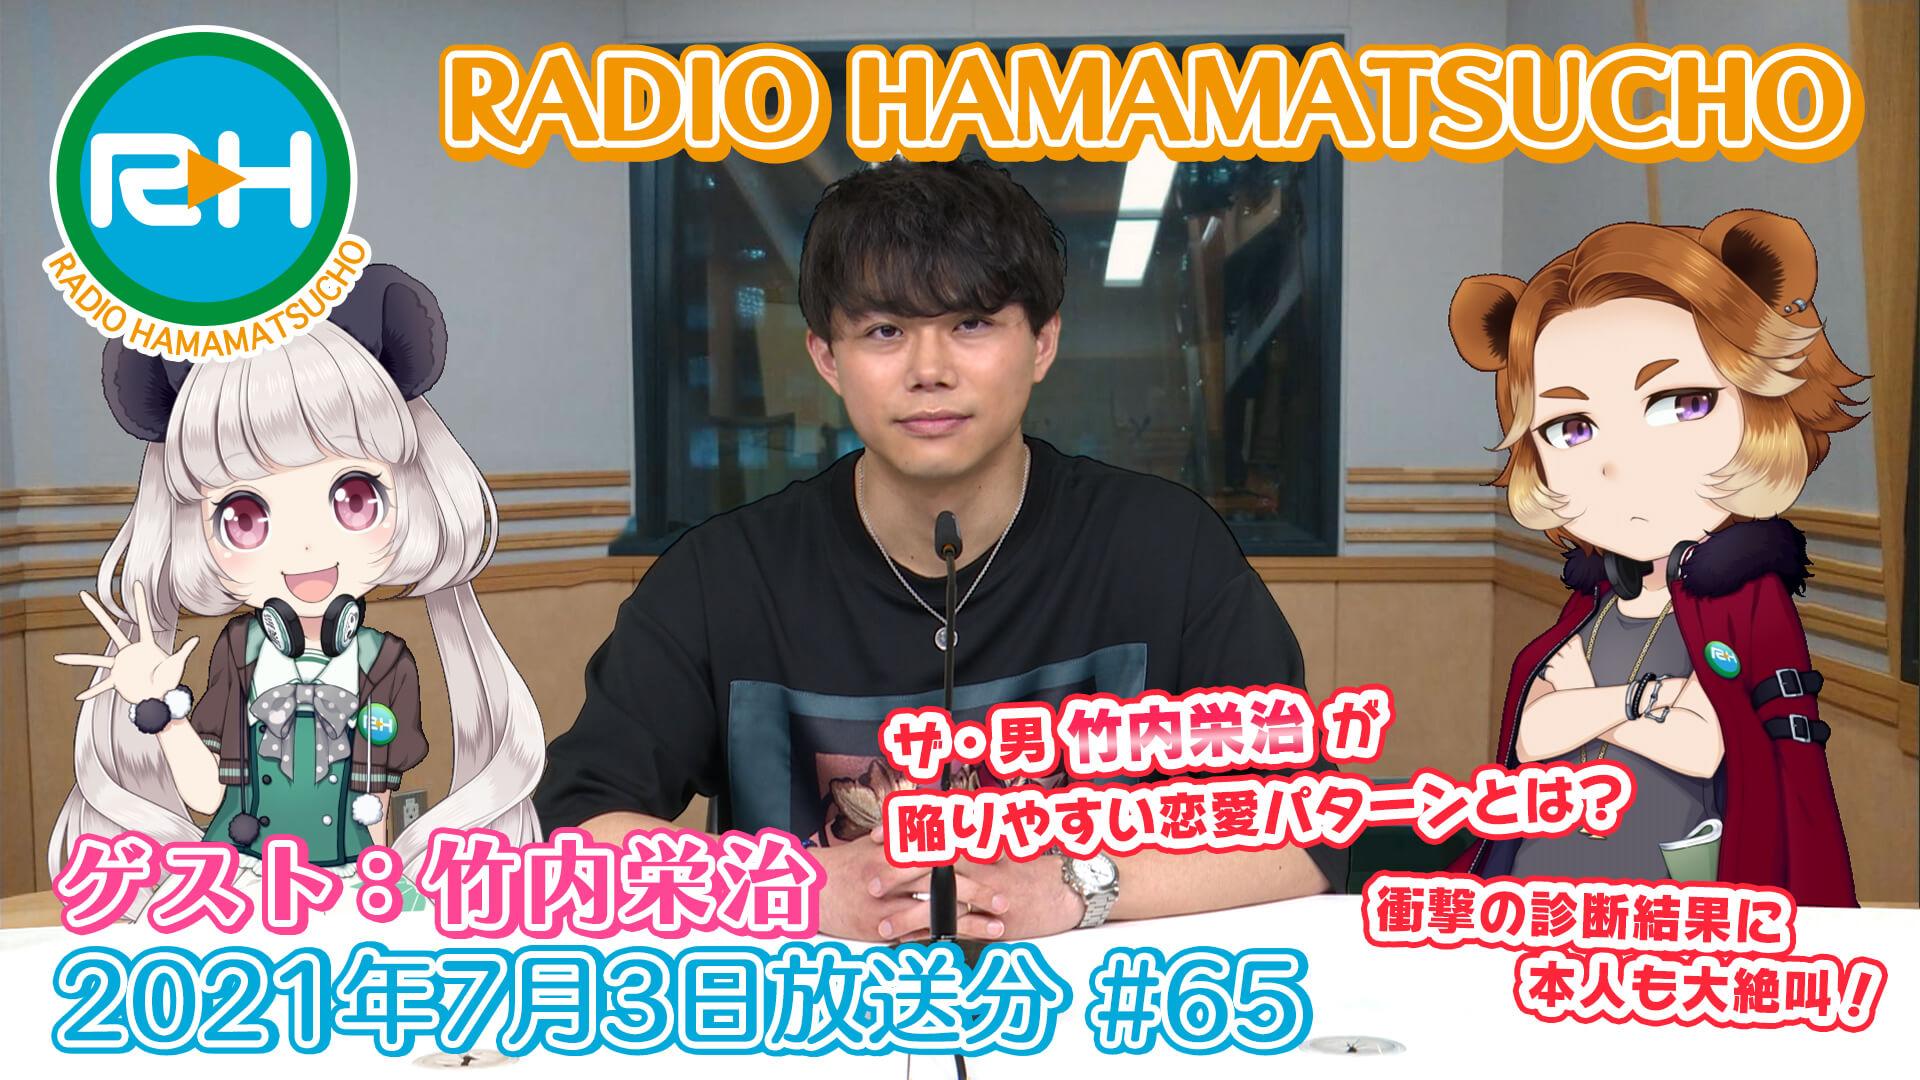 RADIO HAMAMATSUCHO 第65回 (2021年7月3日放送分) ゲスト: 竹内栄治